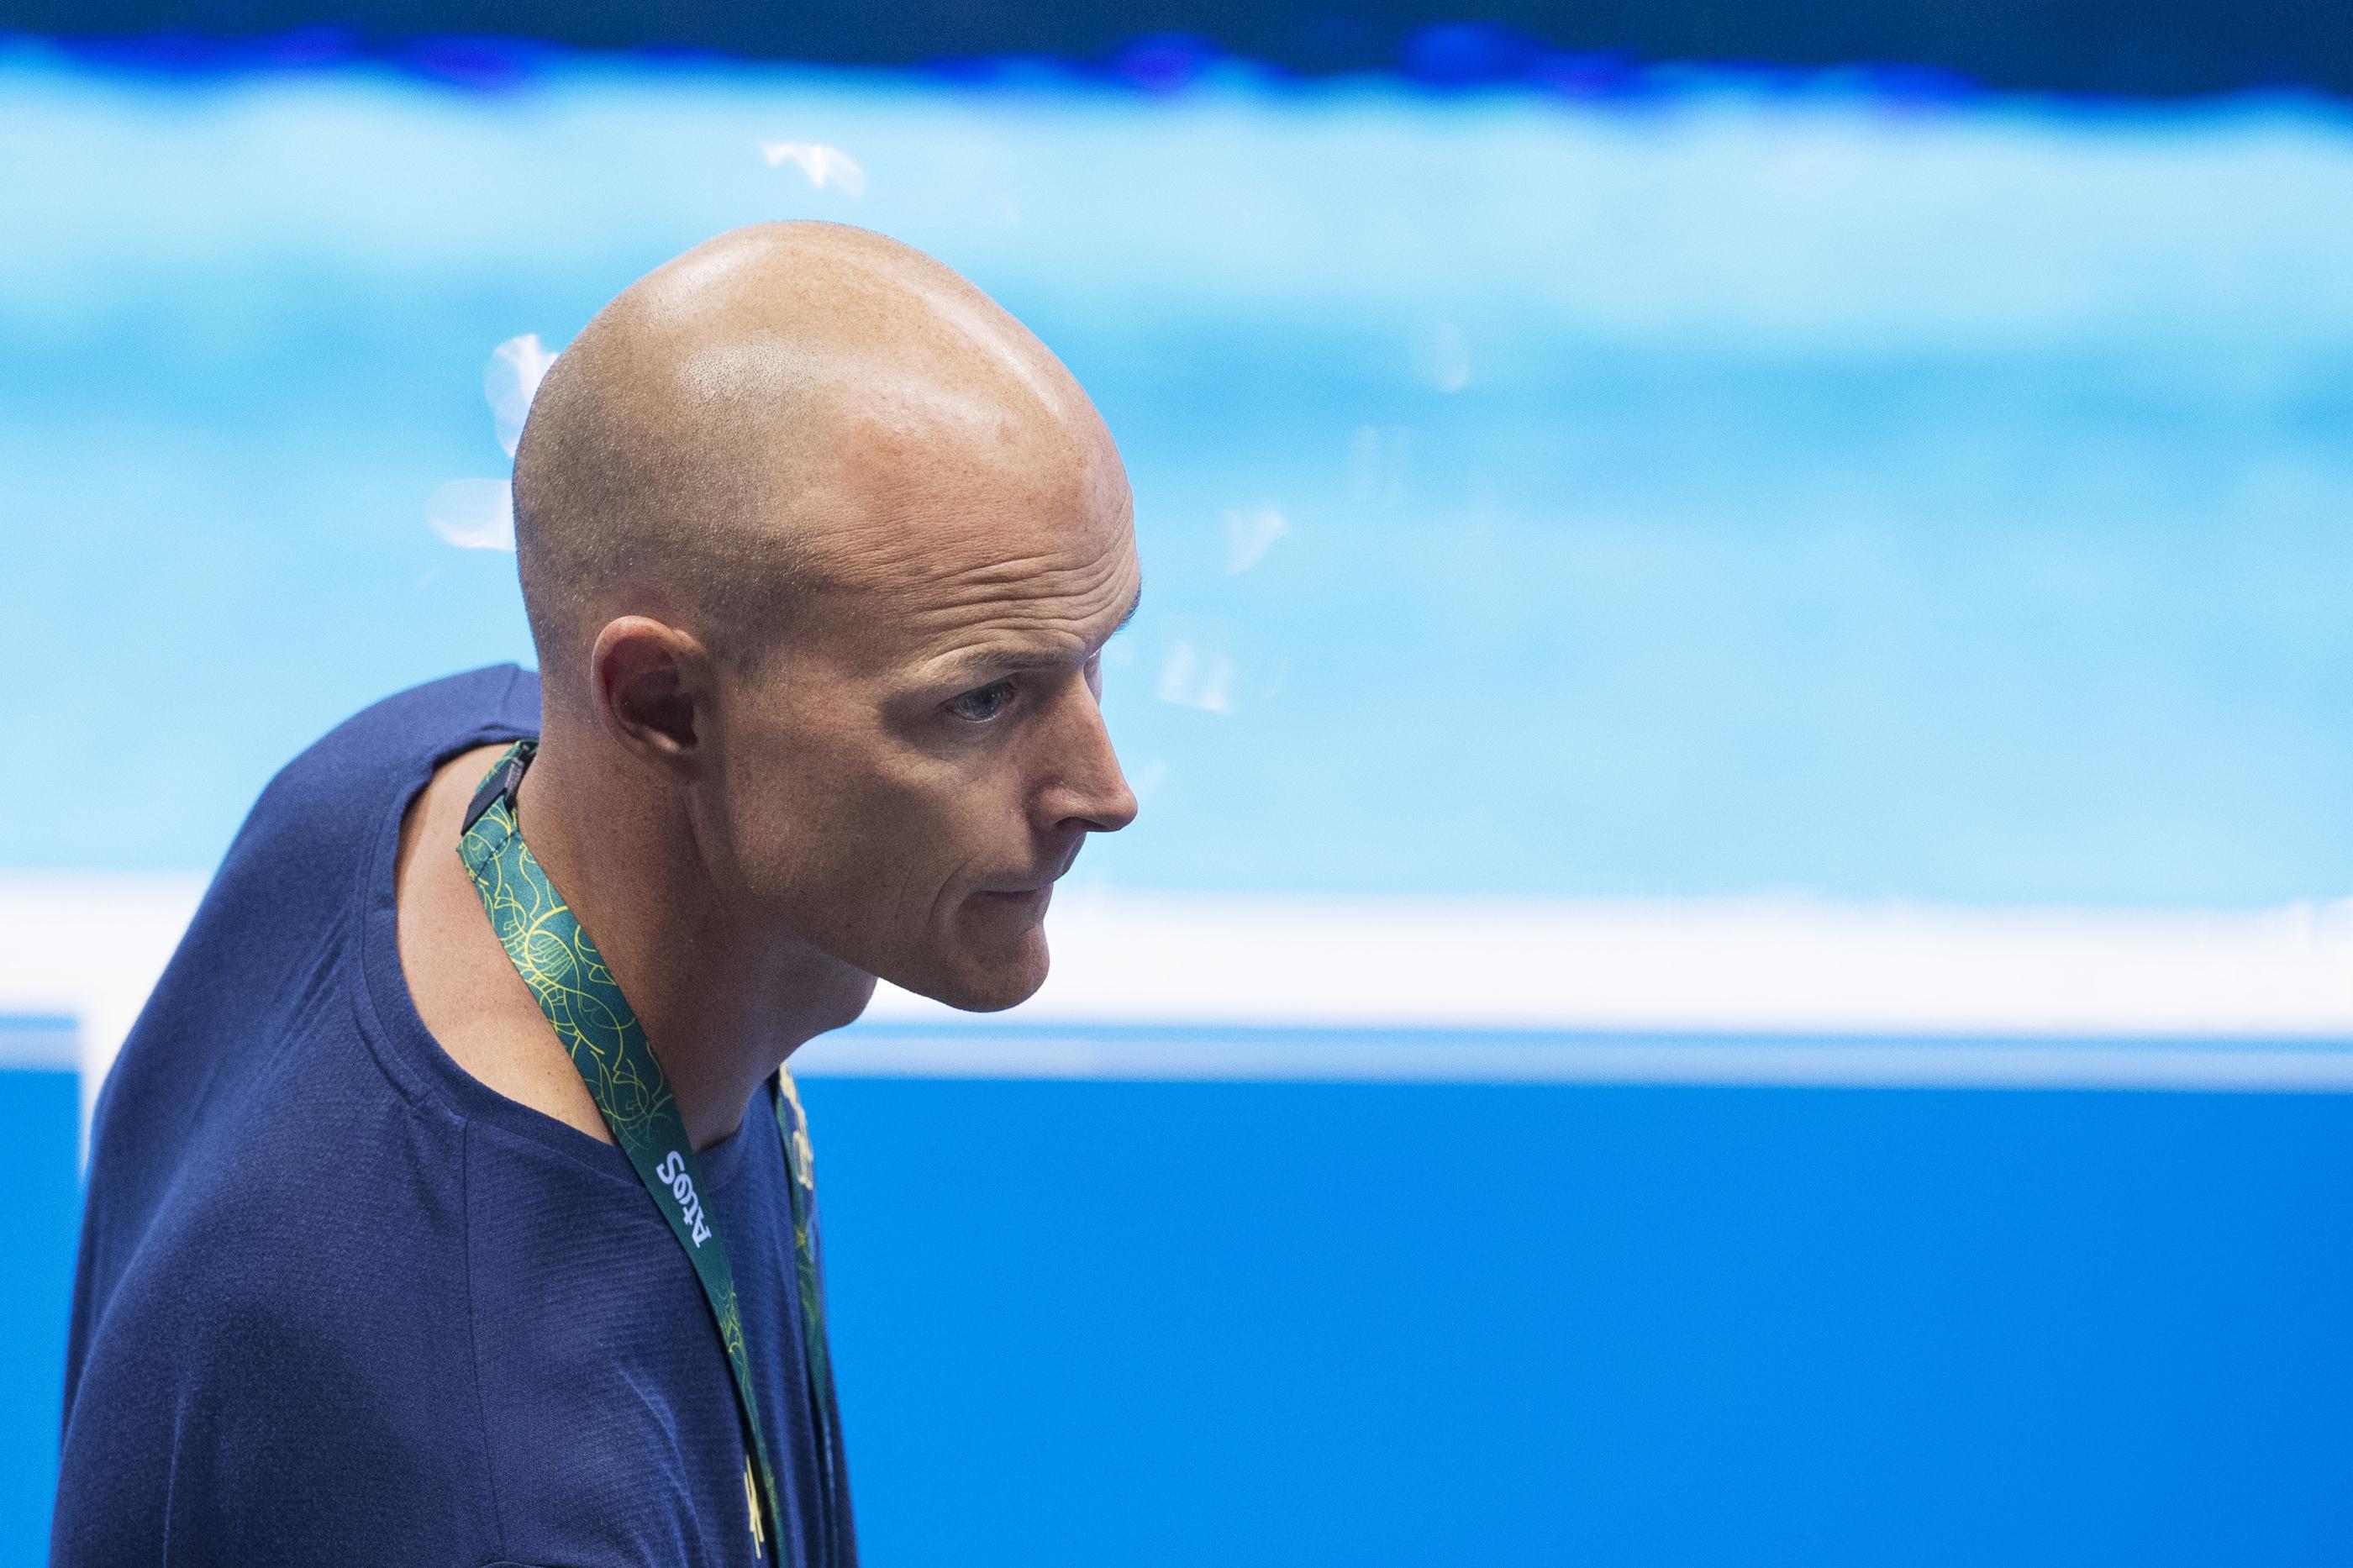 johan wallberg simning